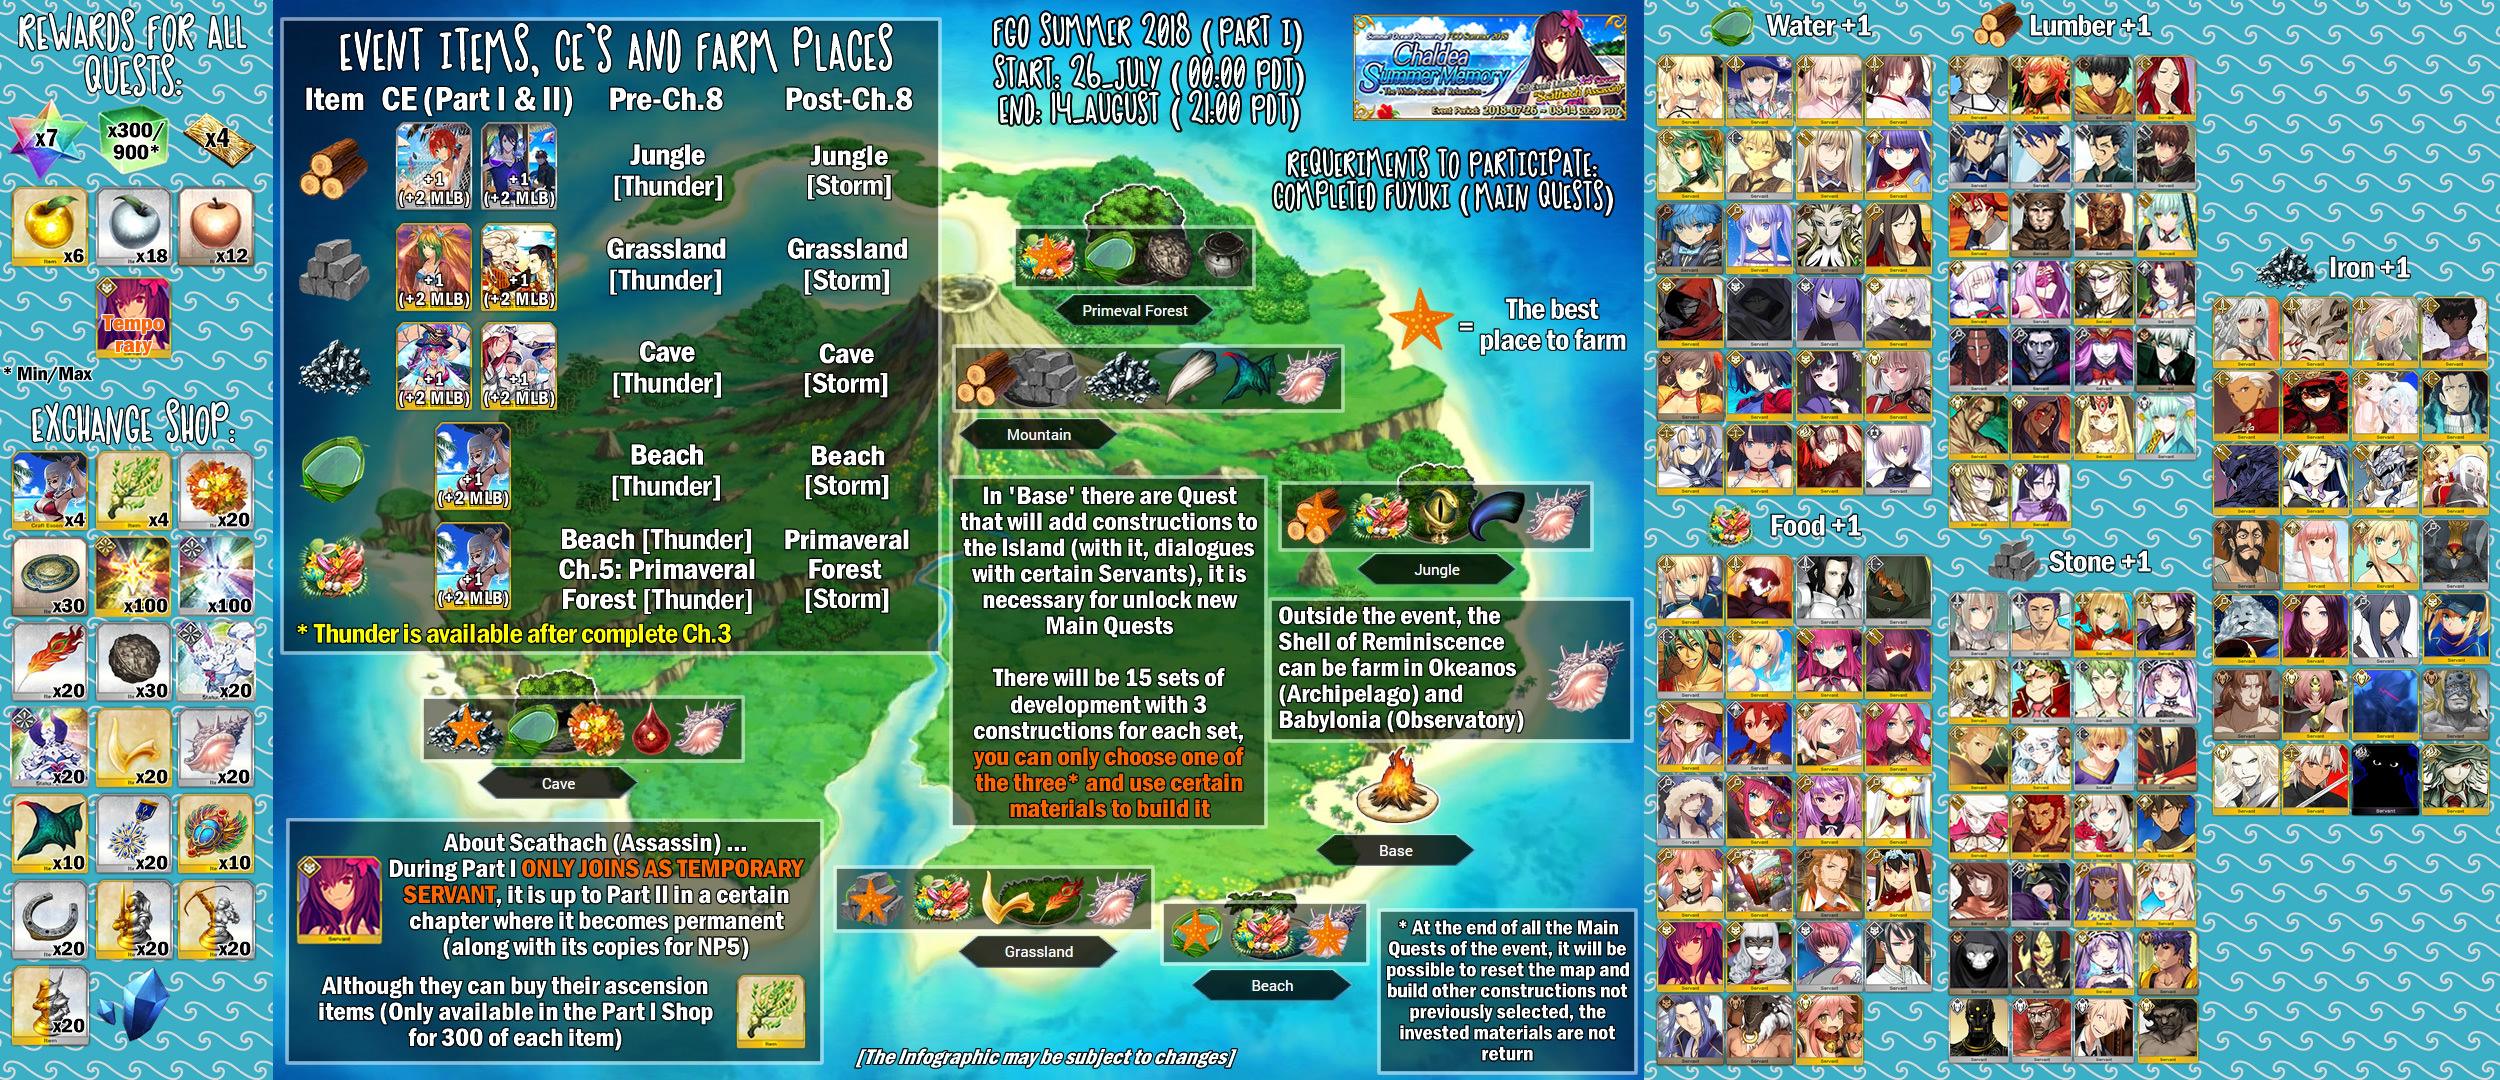 Summer Event Part 1 NA Guide | FANDOM